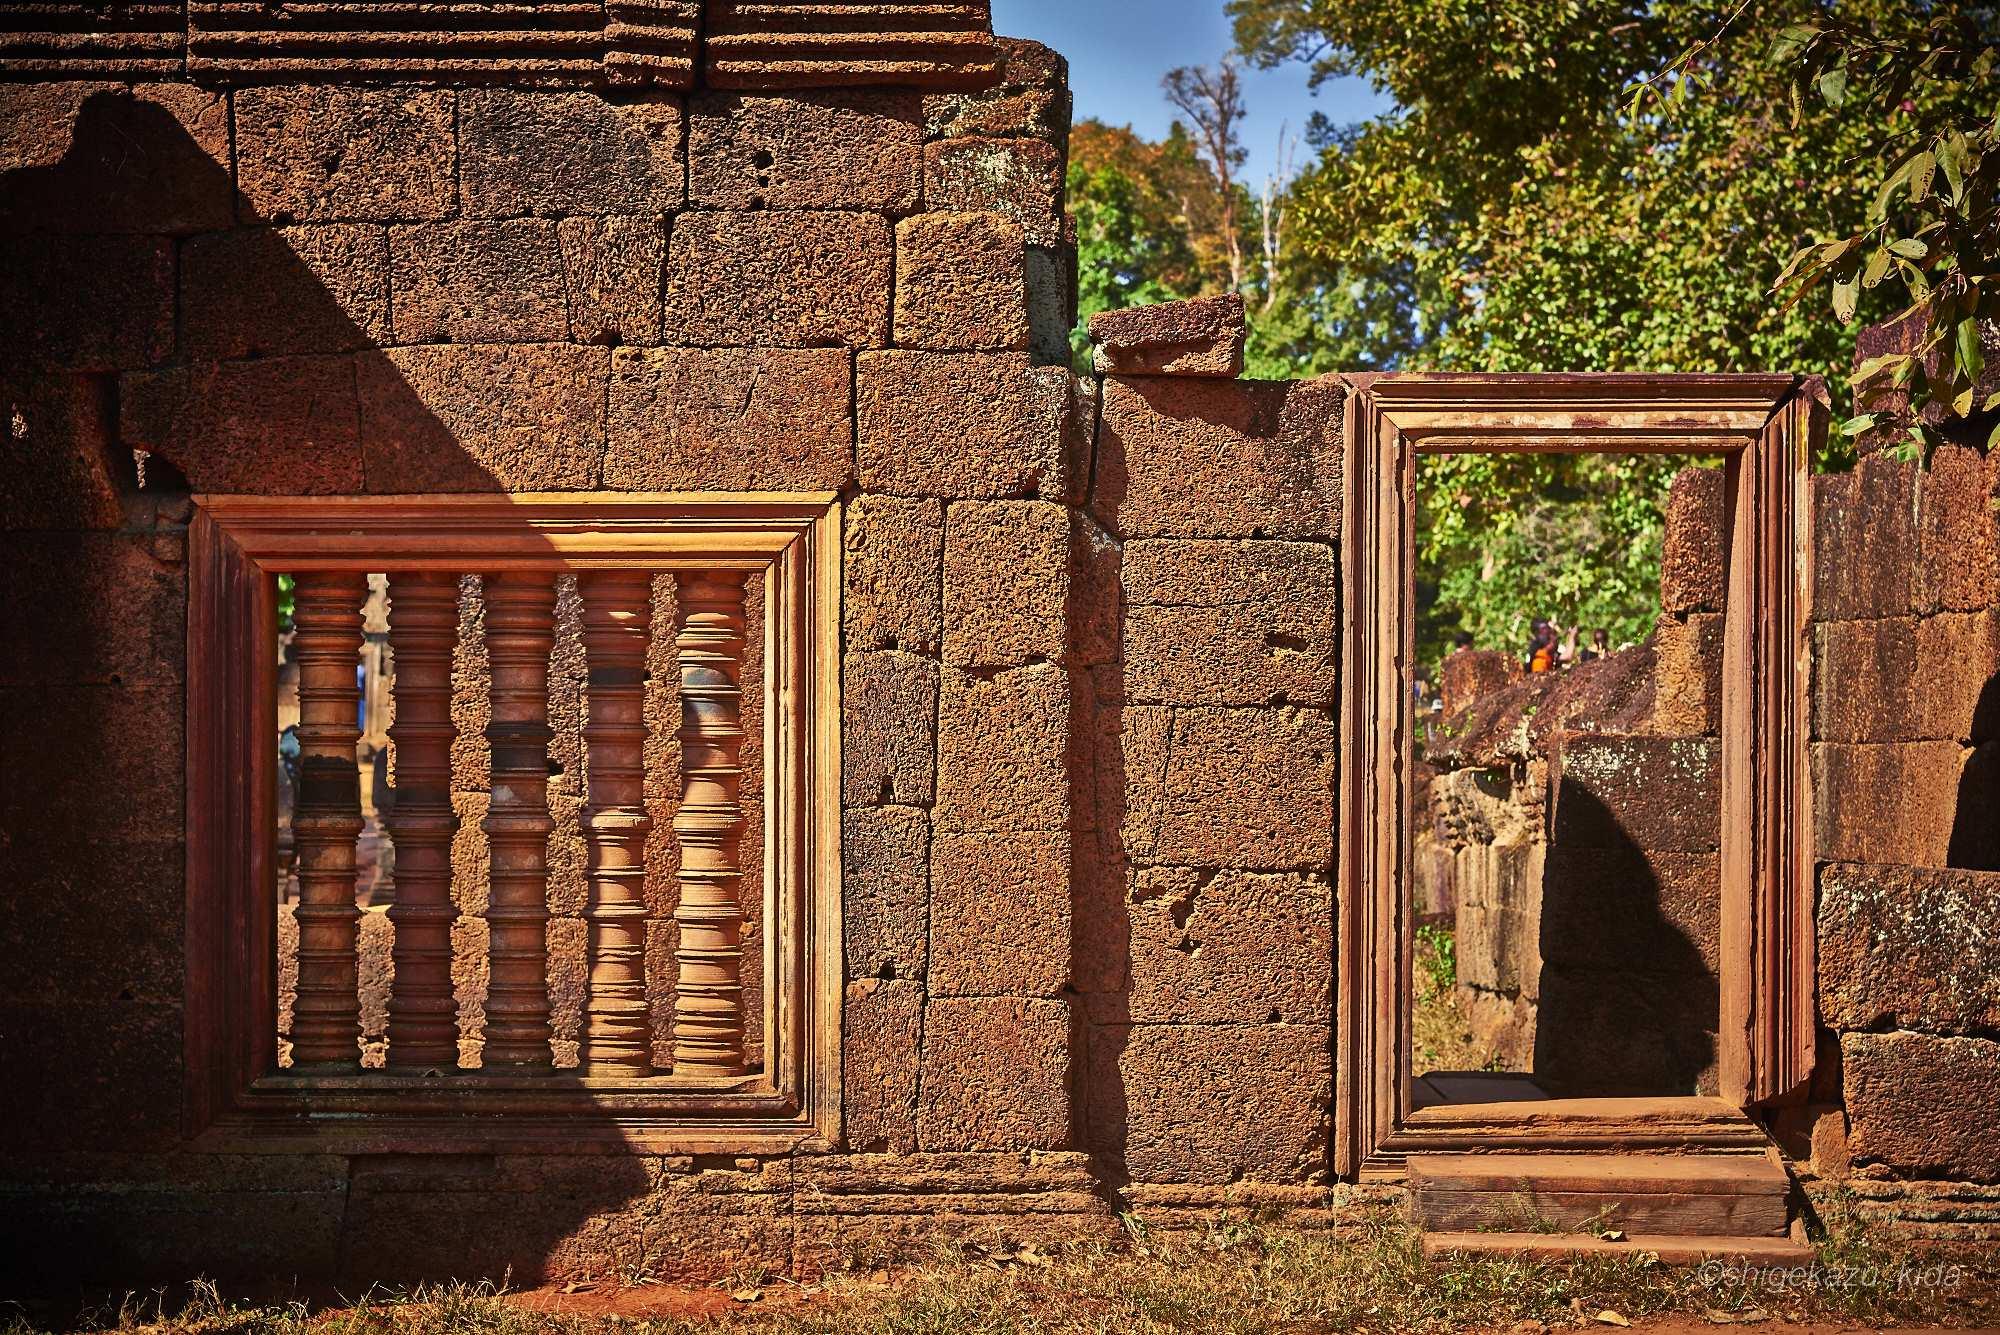 Angkor(アンコール)遺跡群にあるBanteaySrei(バンテアイ・スレイ)の連子窓と扉